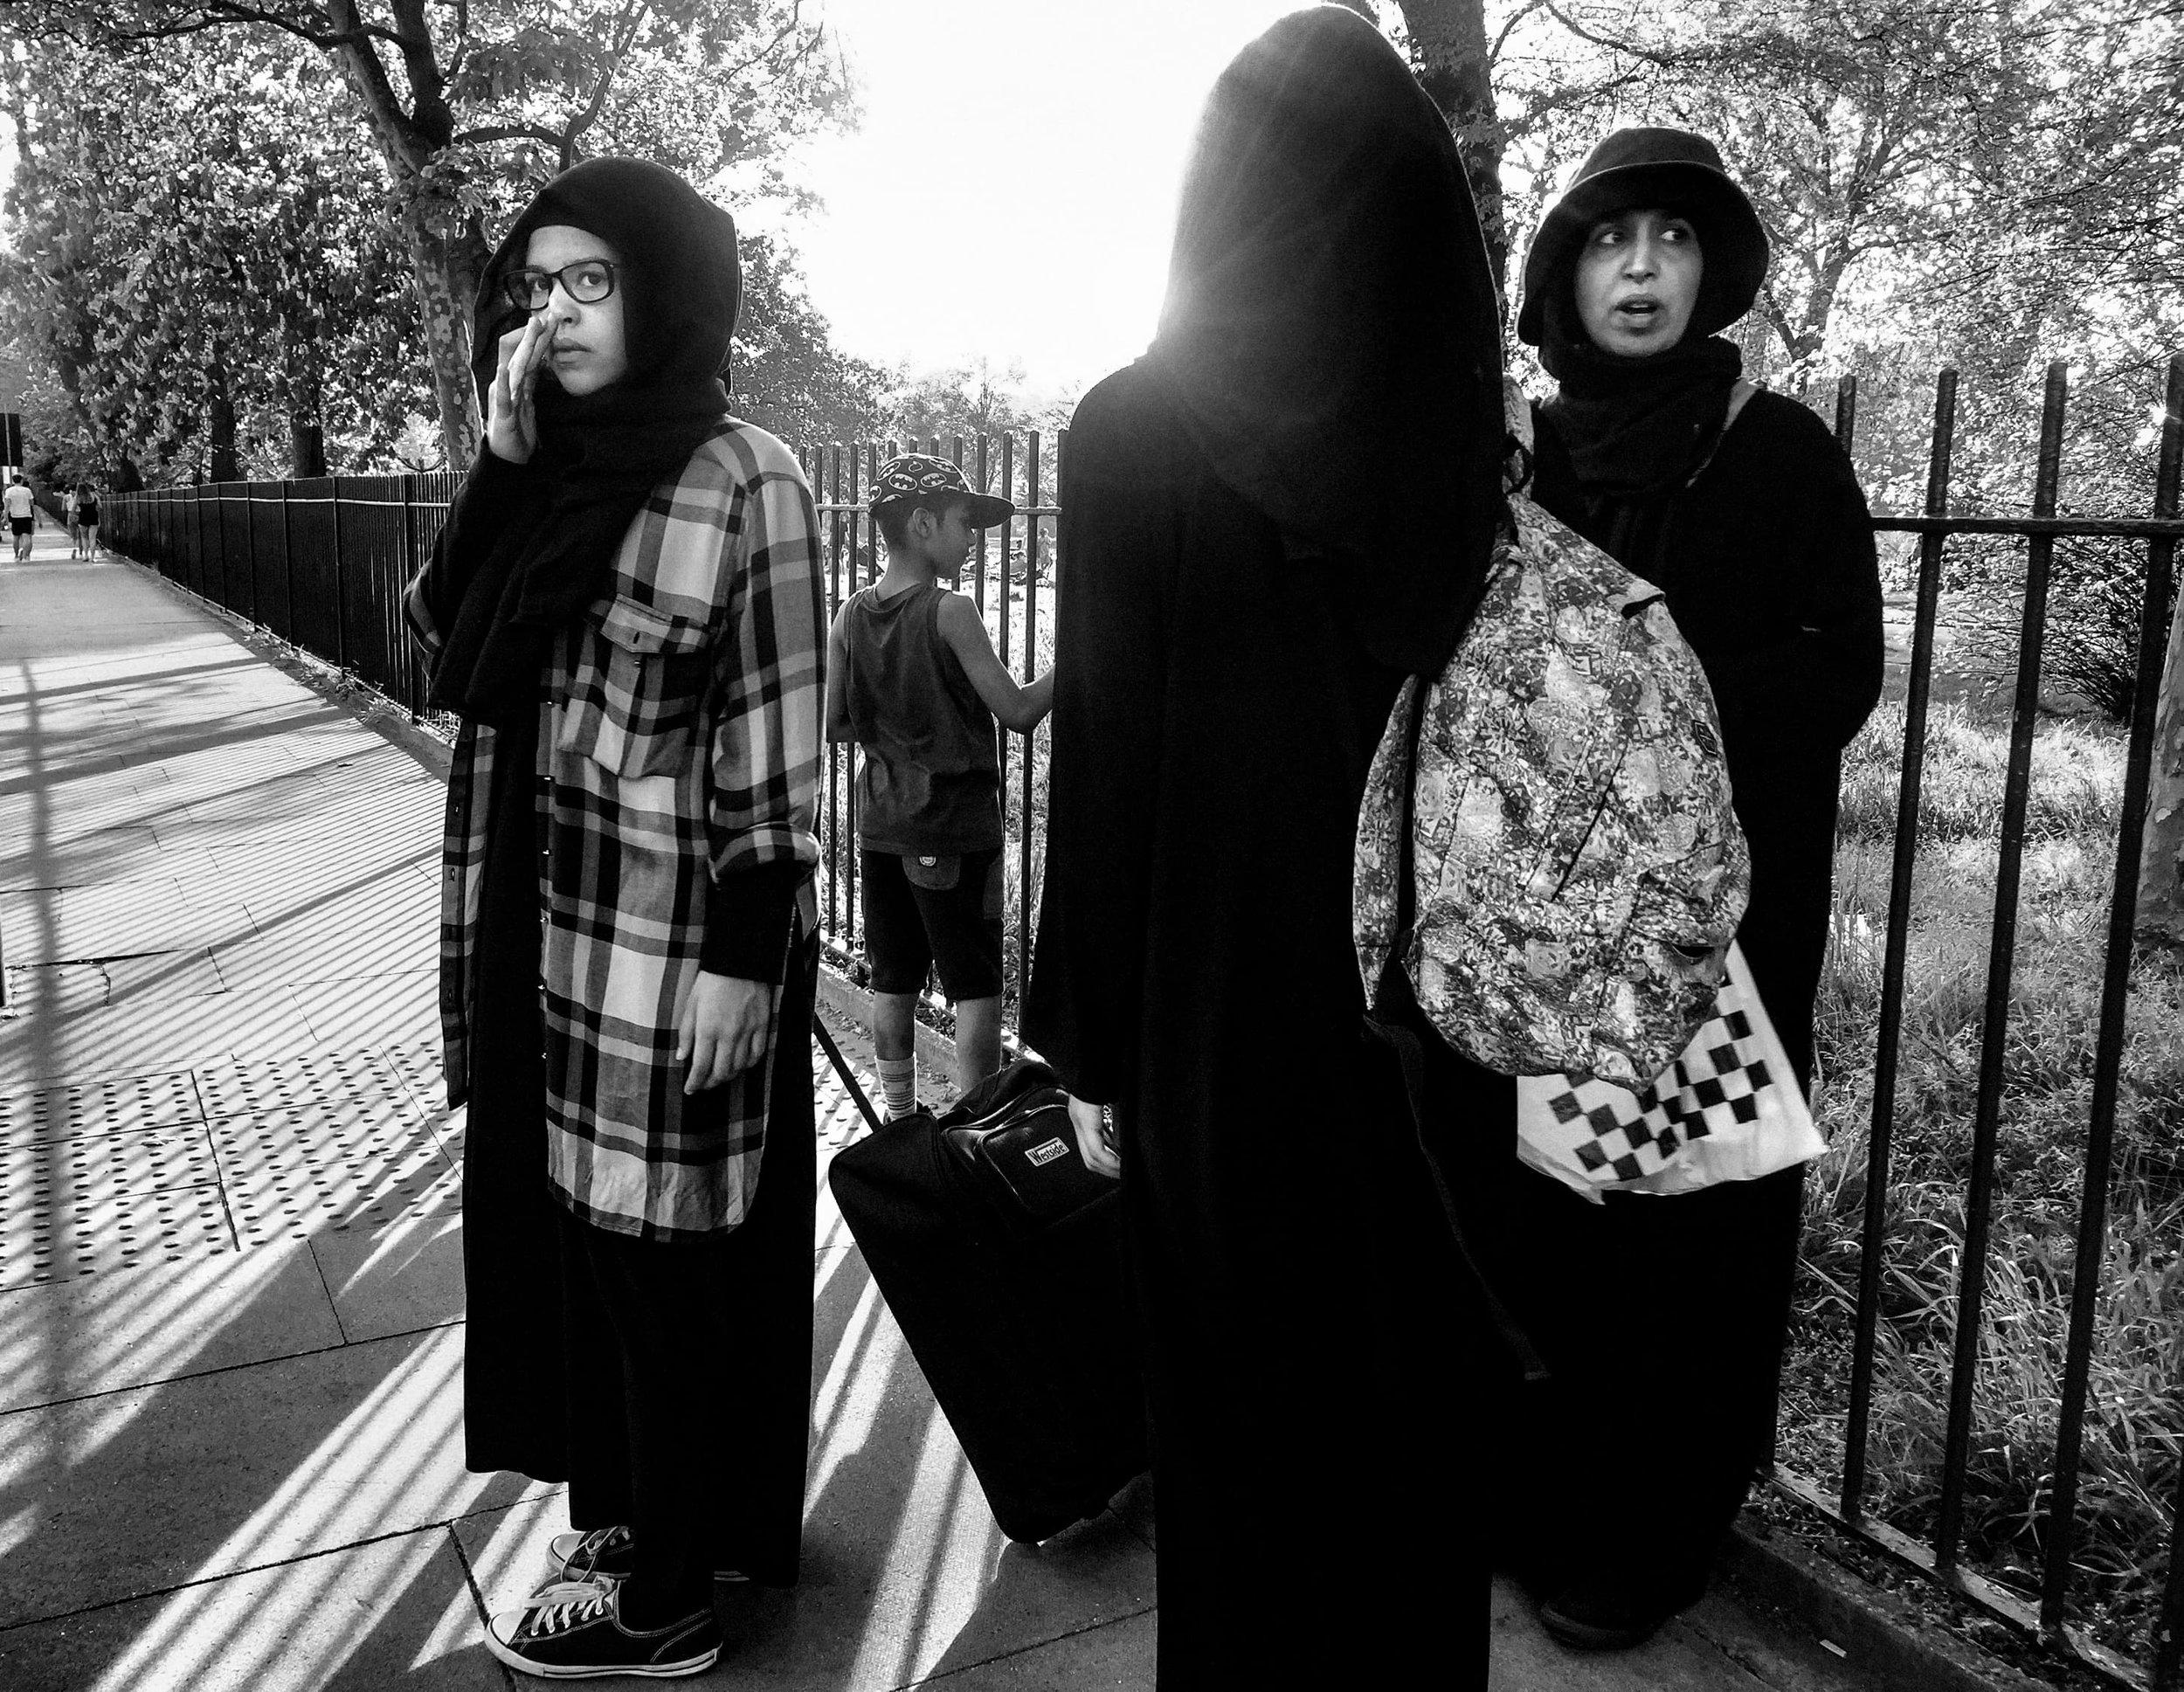 street-documentary-iphone-photography-fabio-burrelli-16.jpg